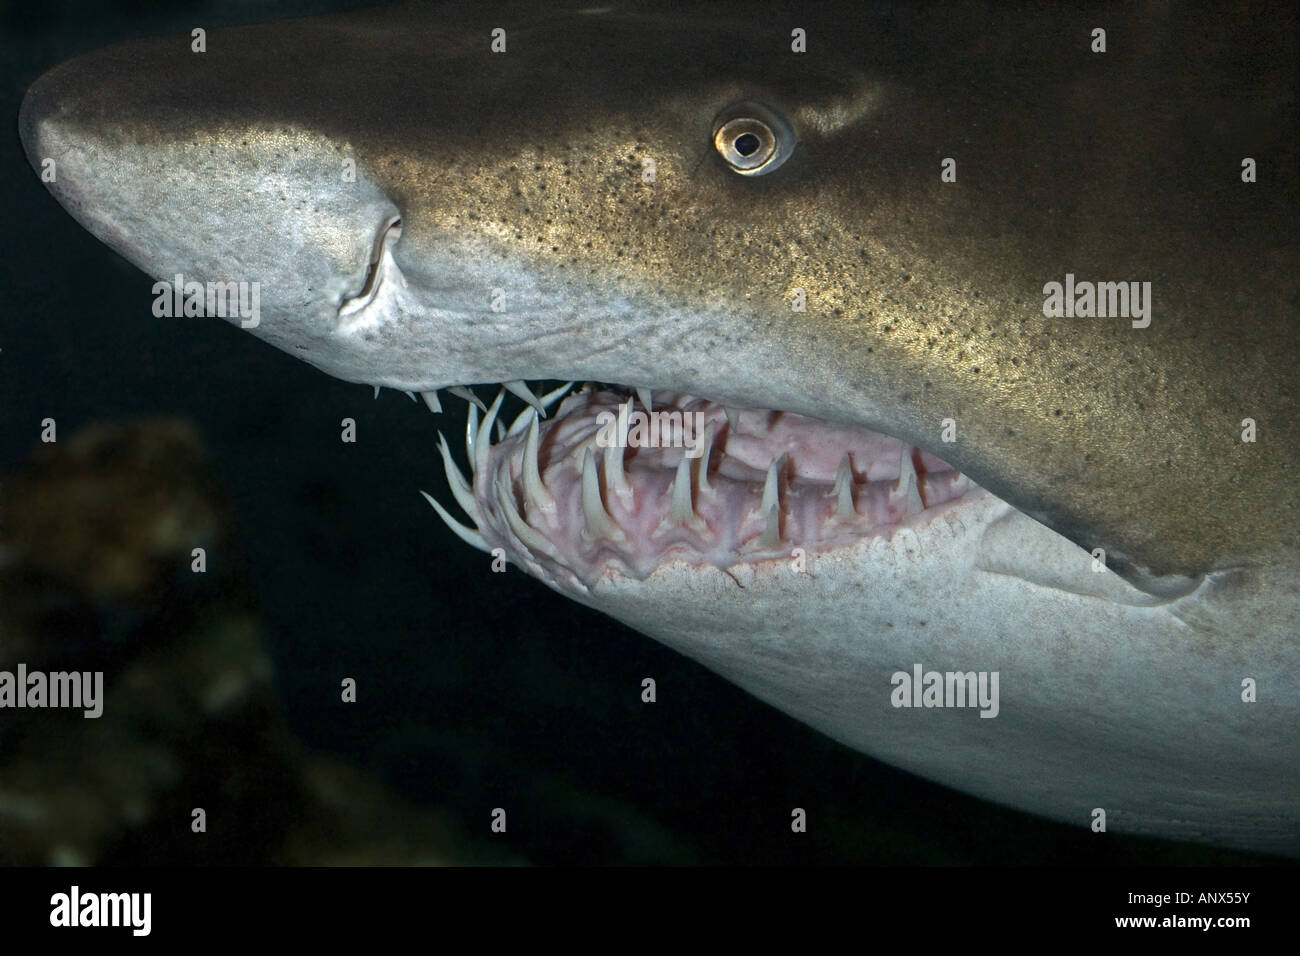 Sand tiger shark information amp pictures of sand tiger sharks - Sand Shark Sand Tiger Shark Sandtiger Shark Gray Nurse Shark Eugomphodus Taurus